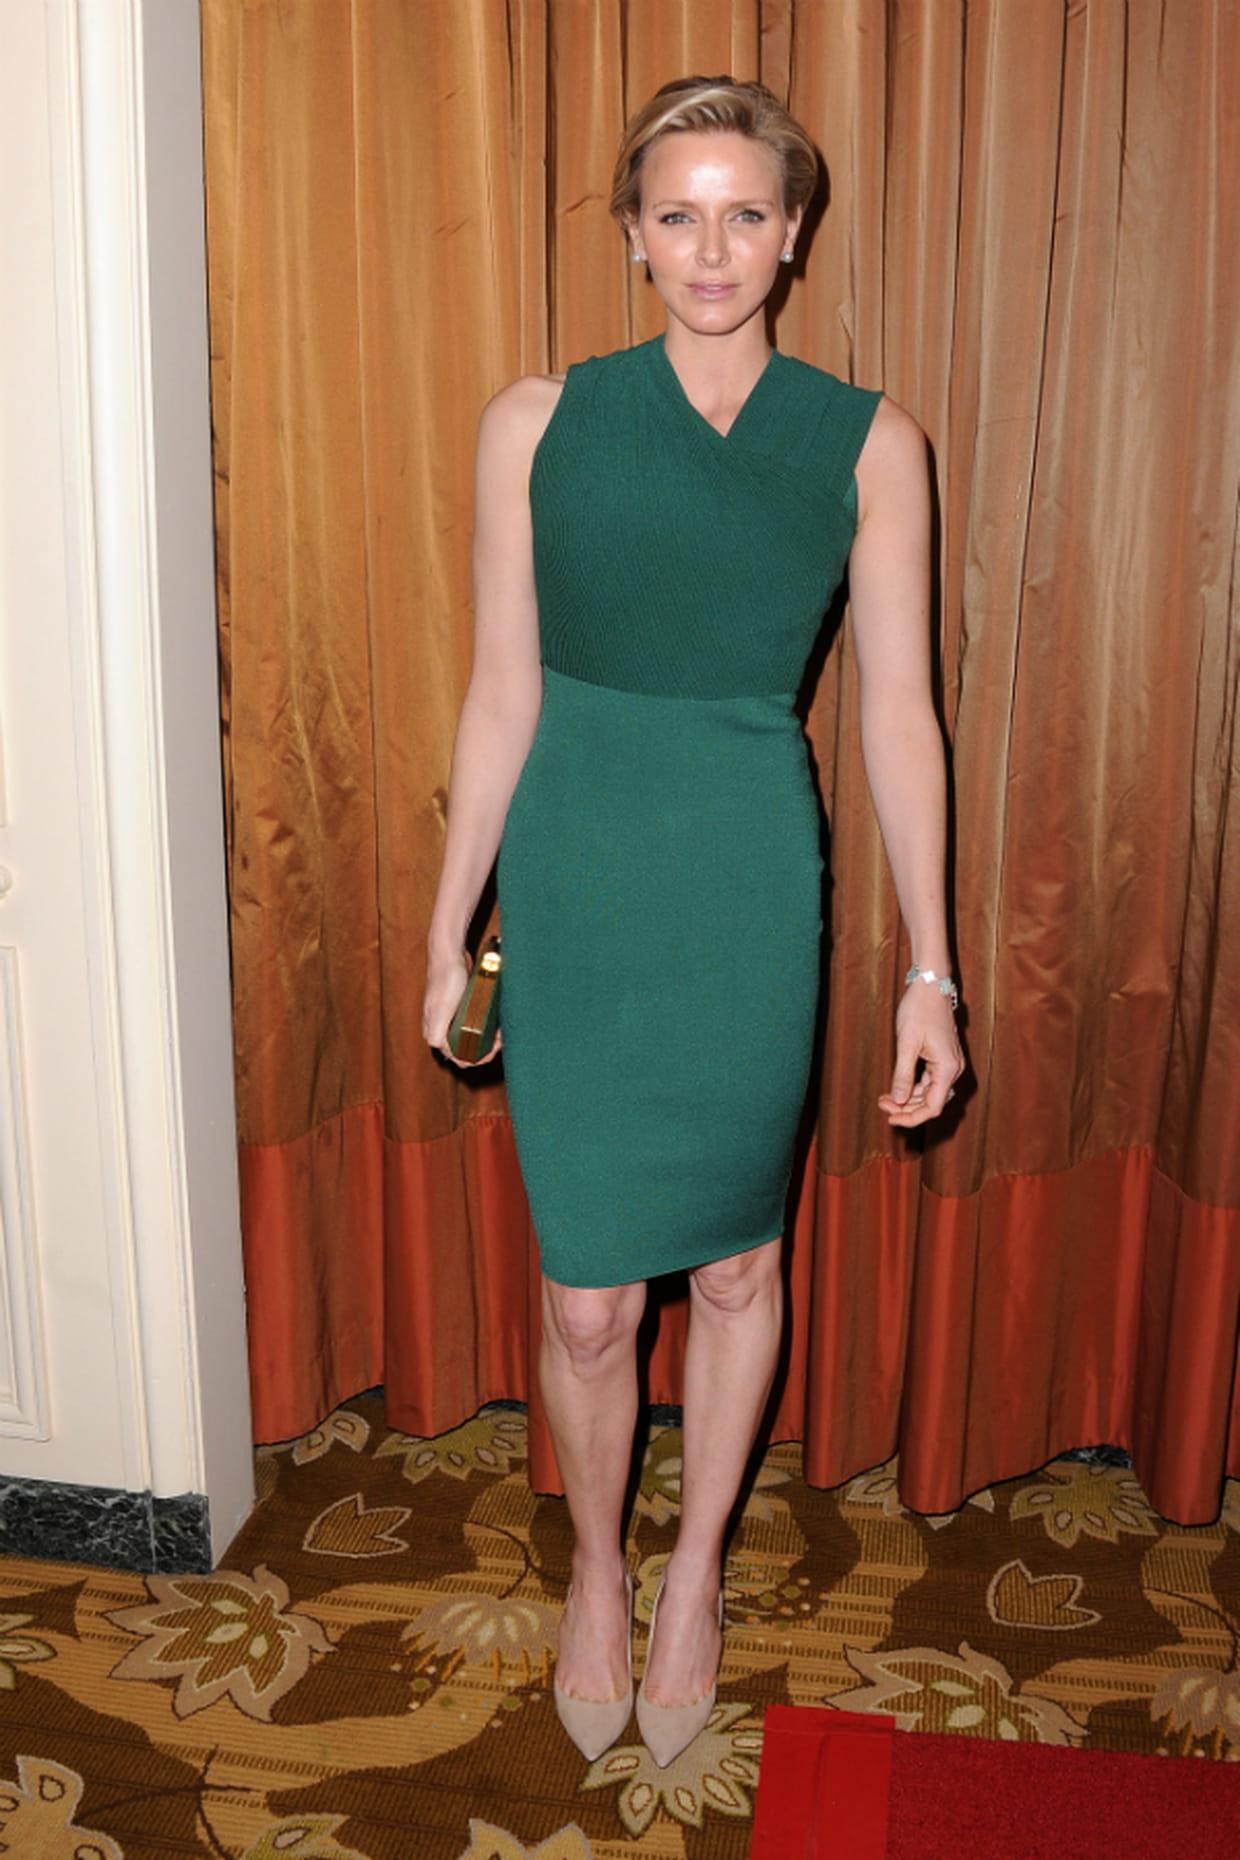 d5dcc94a052 Charlène de Monaco en petite robe verte